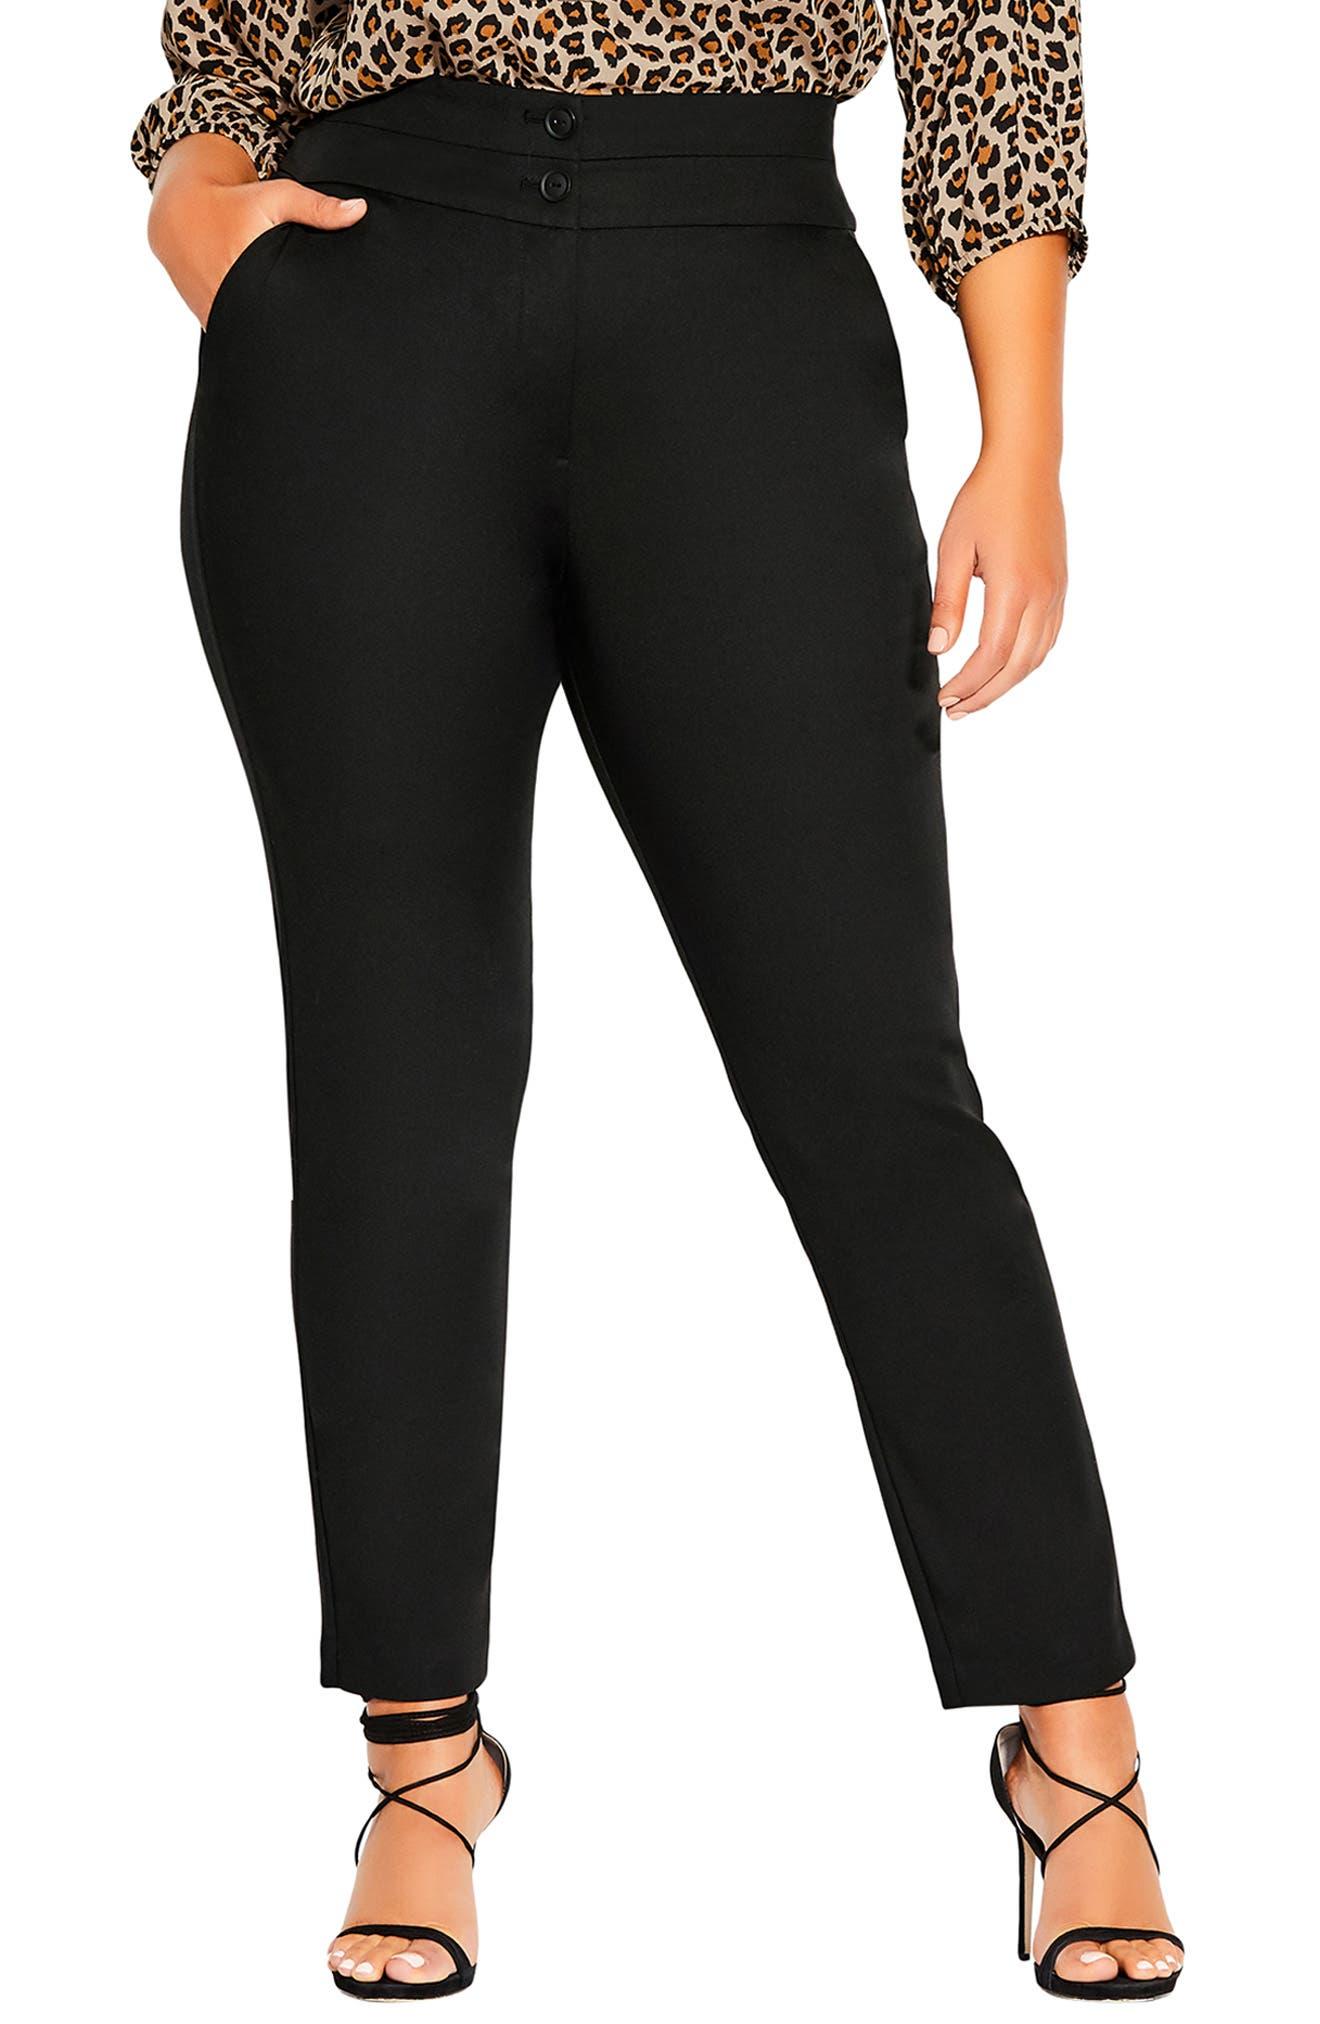 Plus Women's City Chic Affluent High Waist Ankle Pants